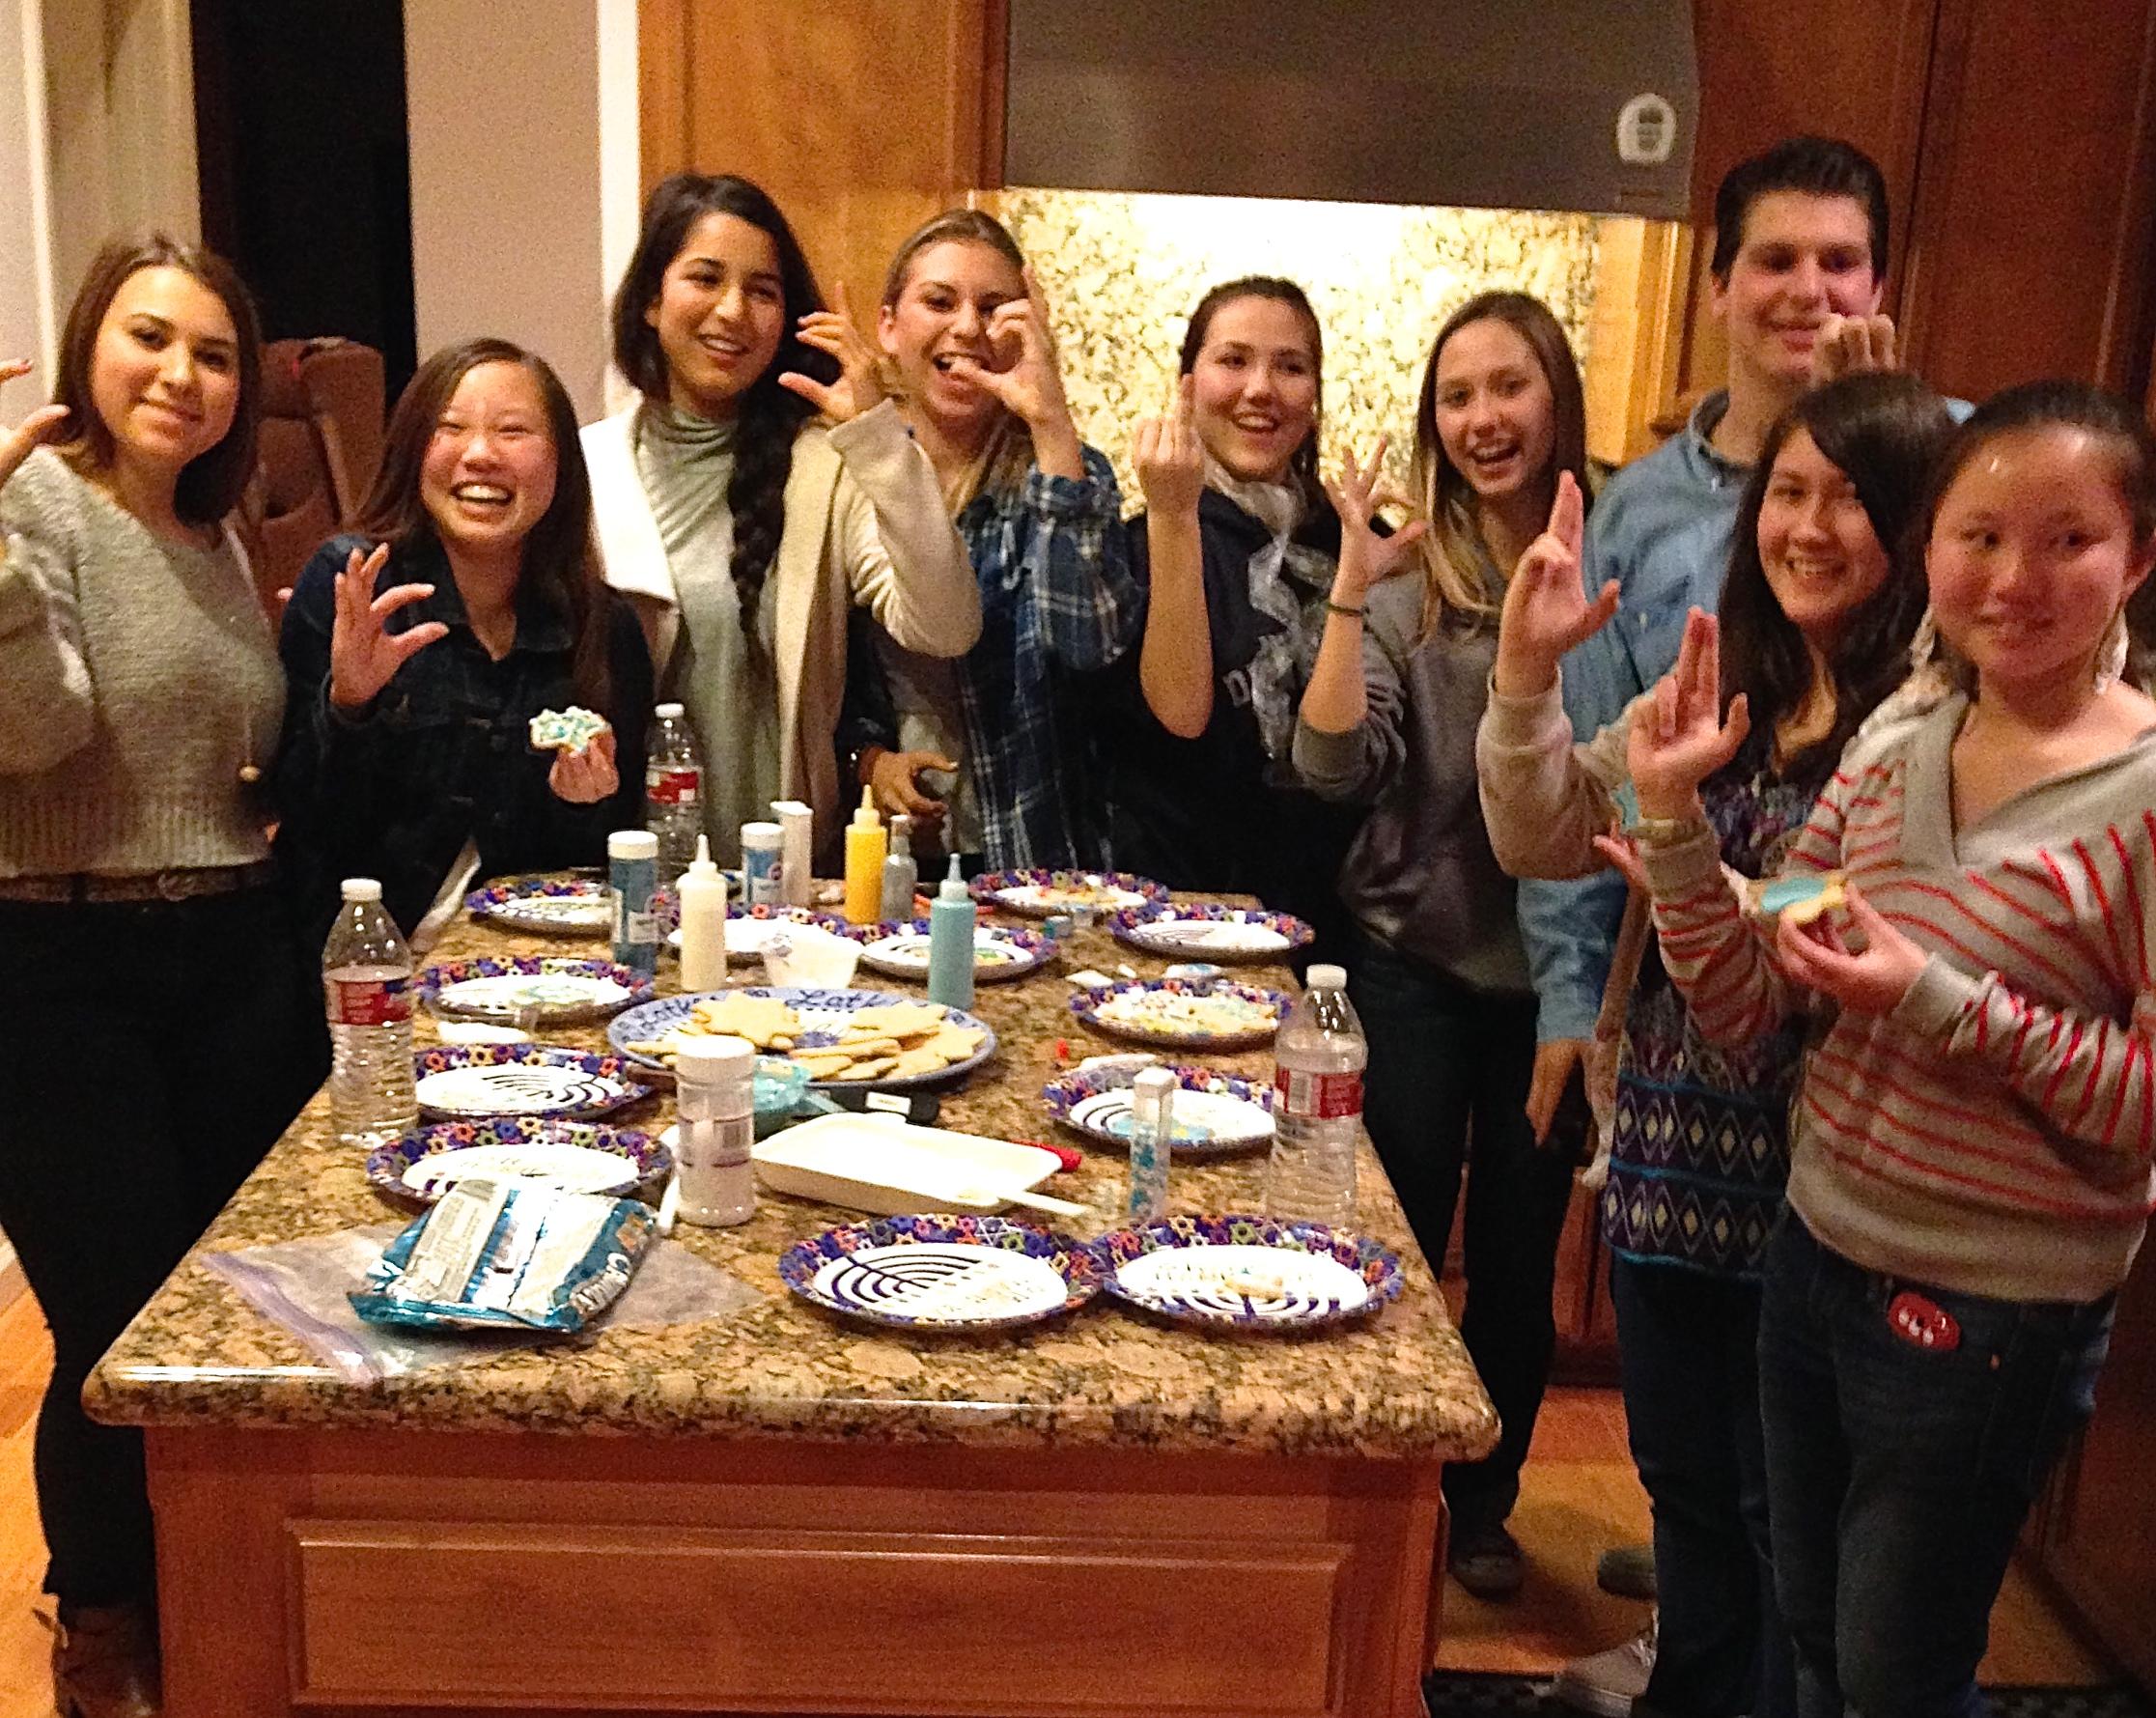 "<span class=""slider_description"">Youth group Hanukah party</span>"